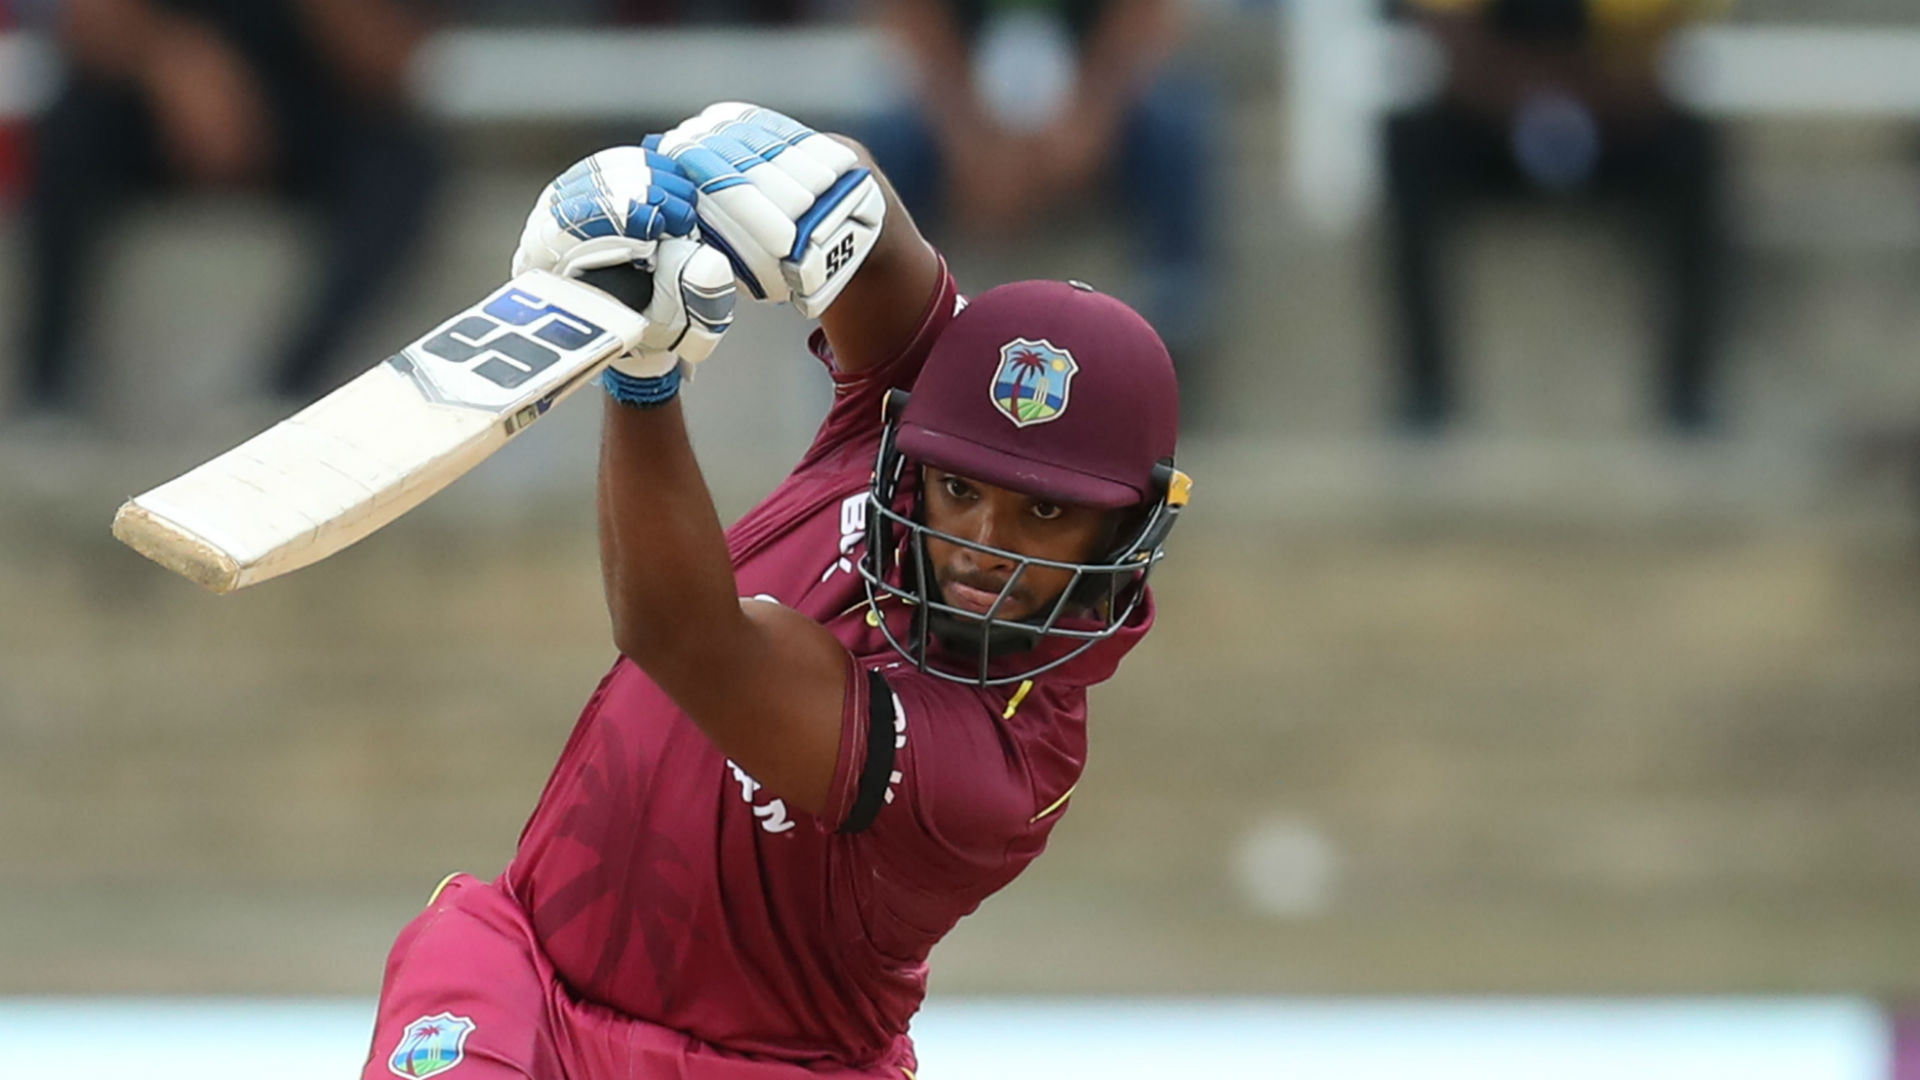 Windies batsman Pooran handed four-game ban for ball tampering